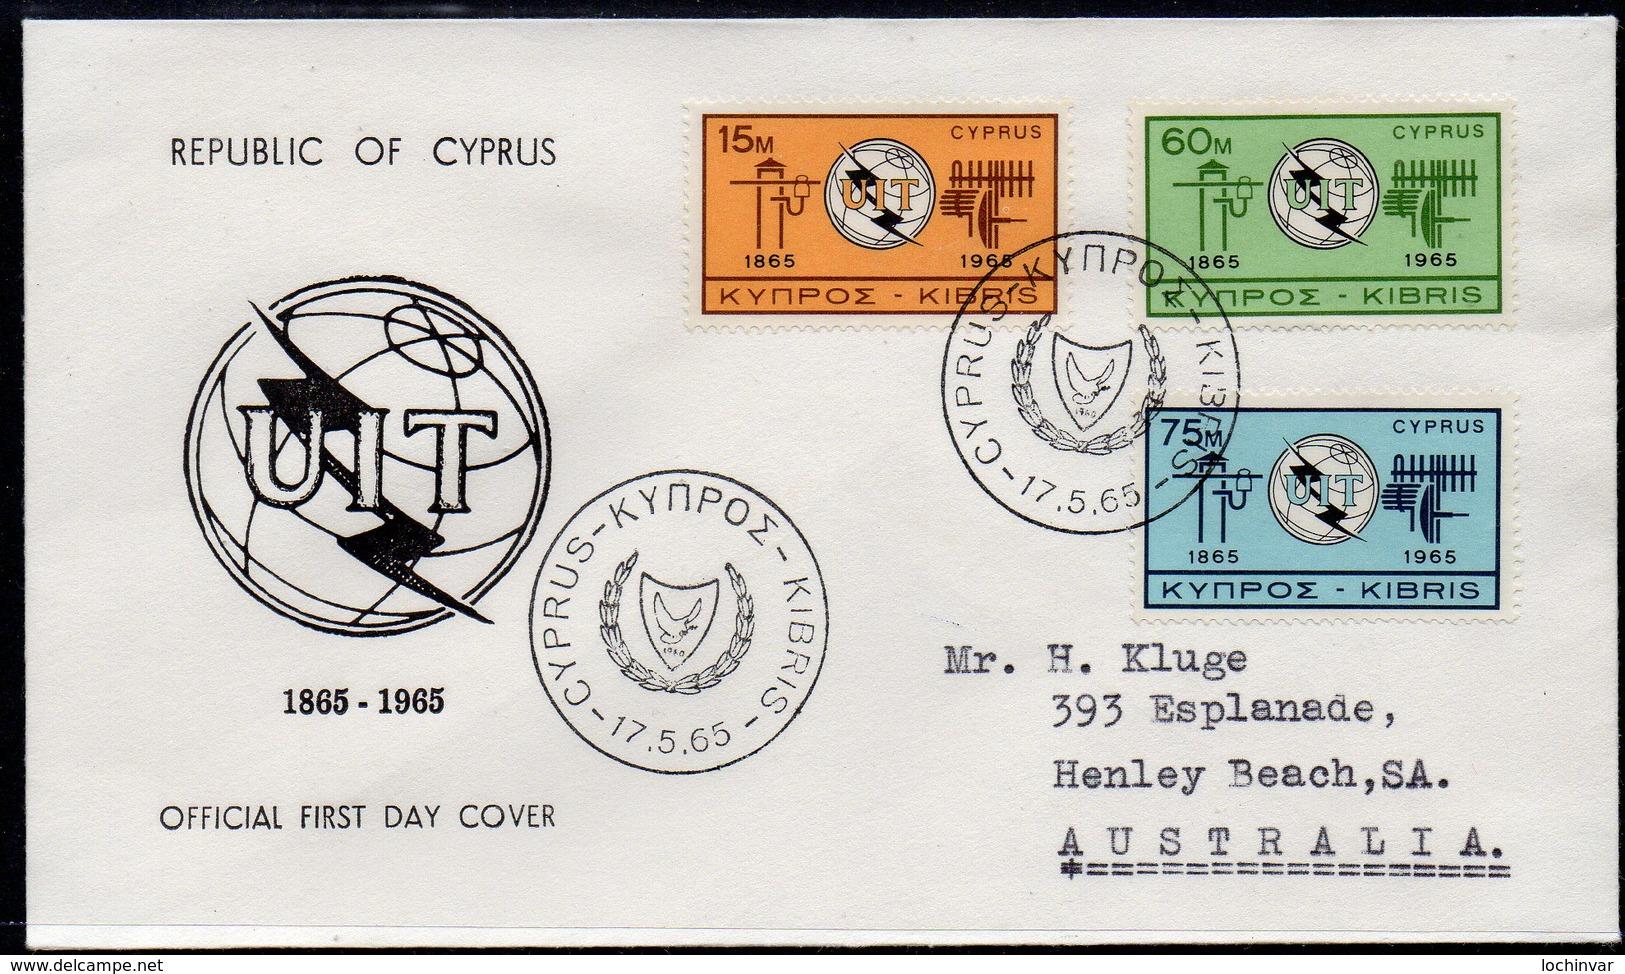 CYPRUS, 1965 ITU FDC - Covers & Documents